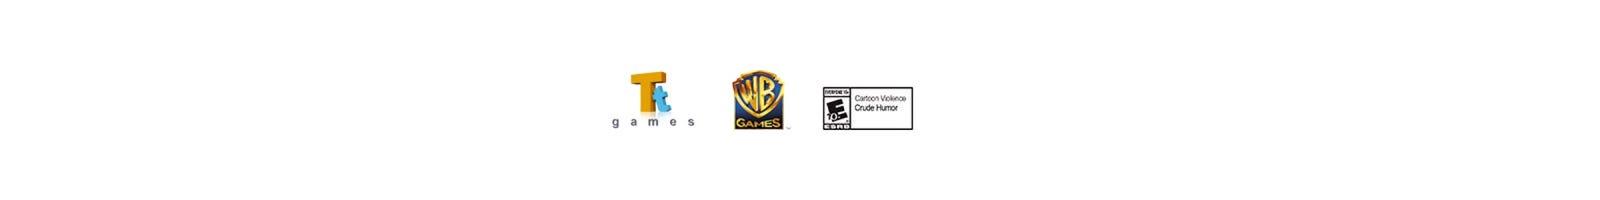 Jurassic World Videogame Collaboration image